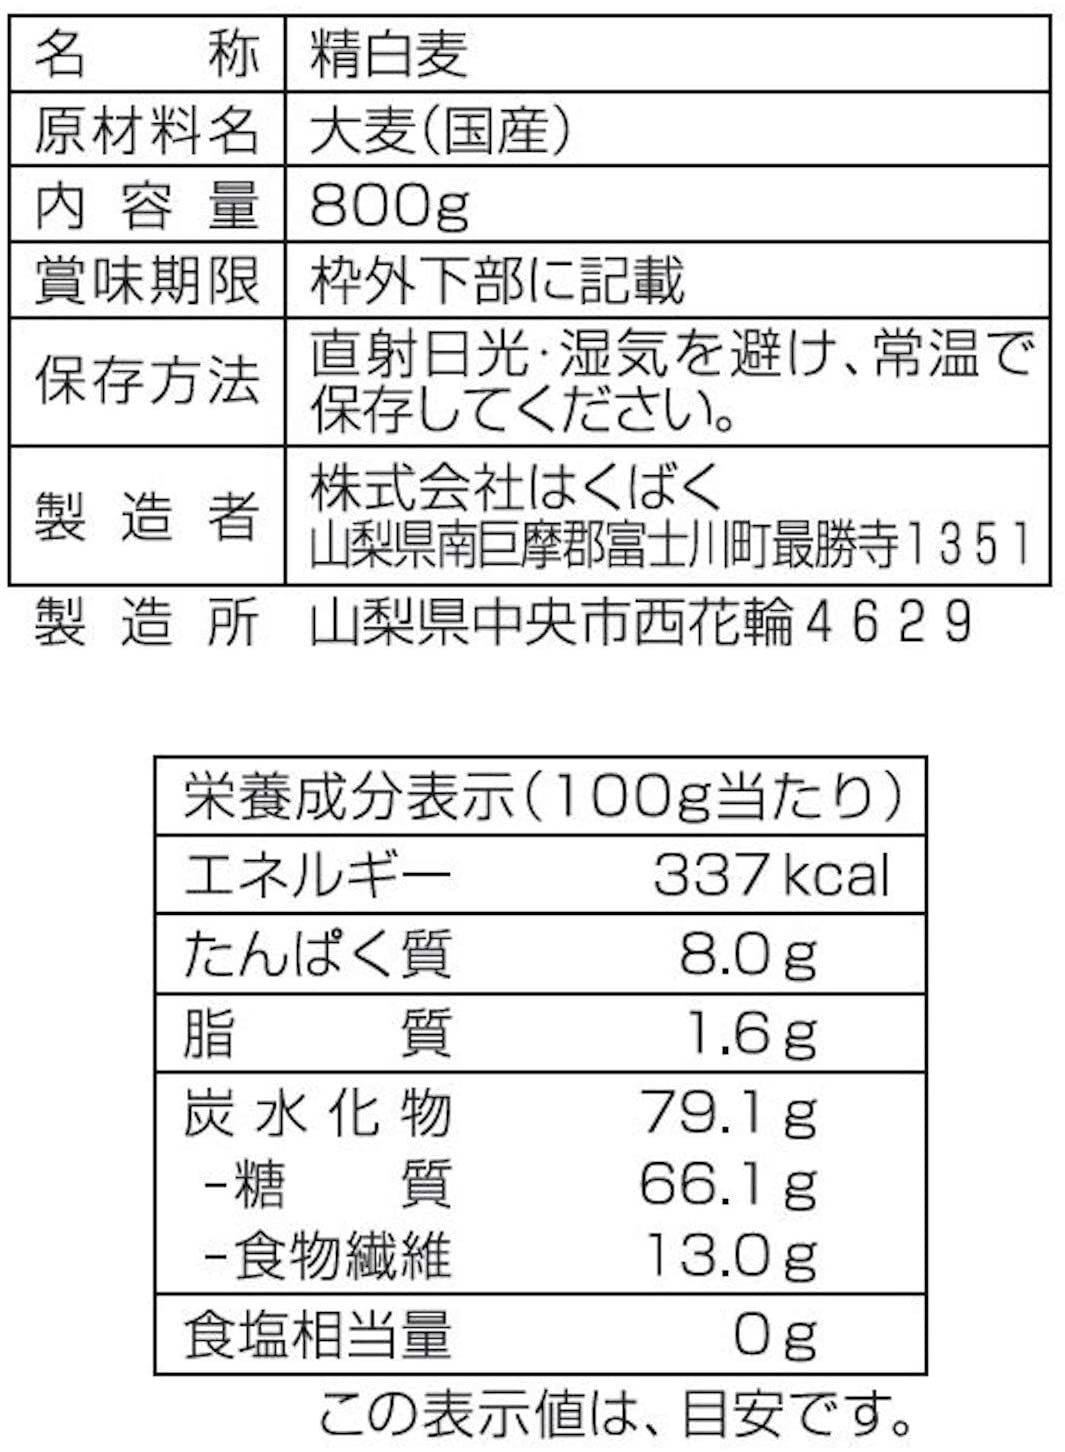 【定期購入】国産もち麦 800g×6袋